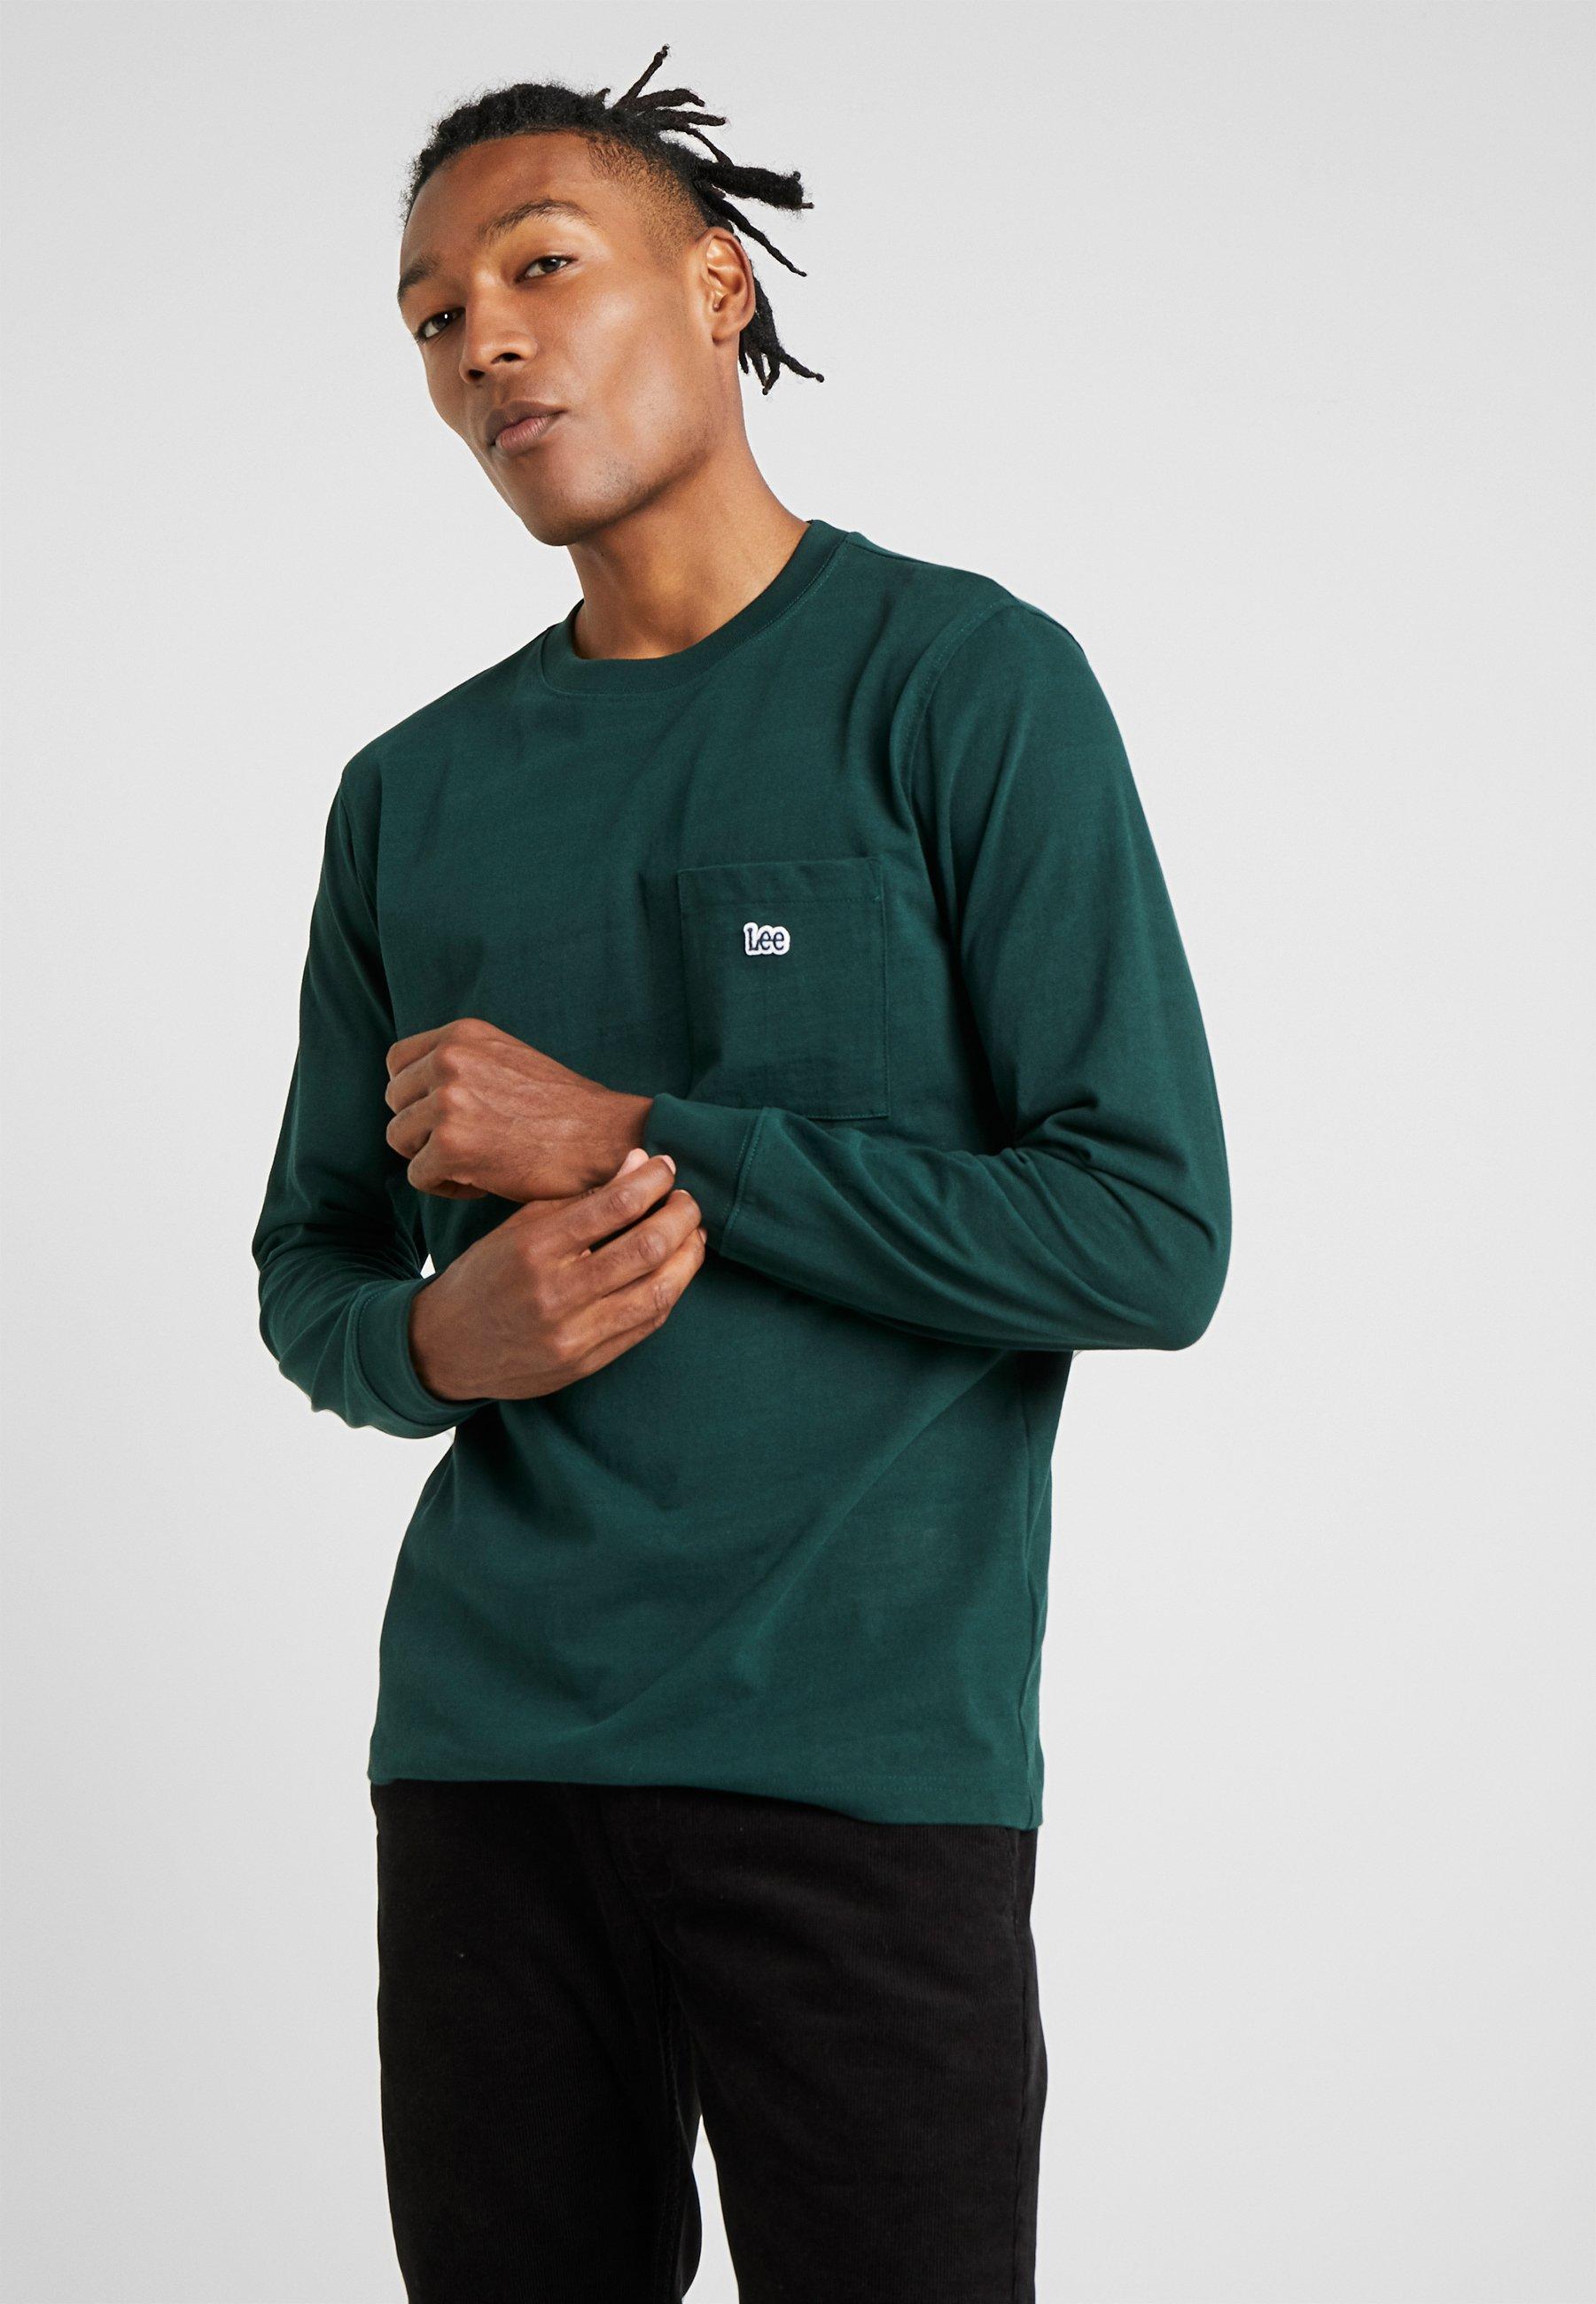 shirt Green Manches Bottle AuthenticT Lee À Longues Dark b7f6Ygy